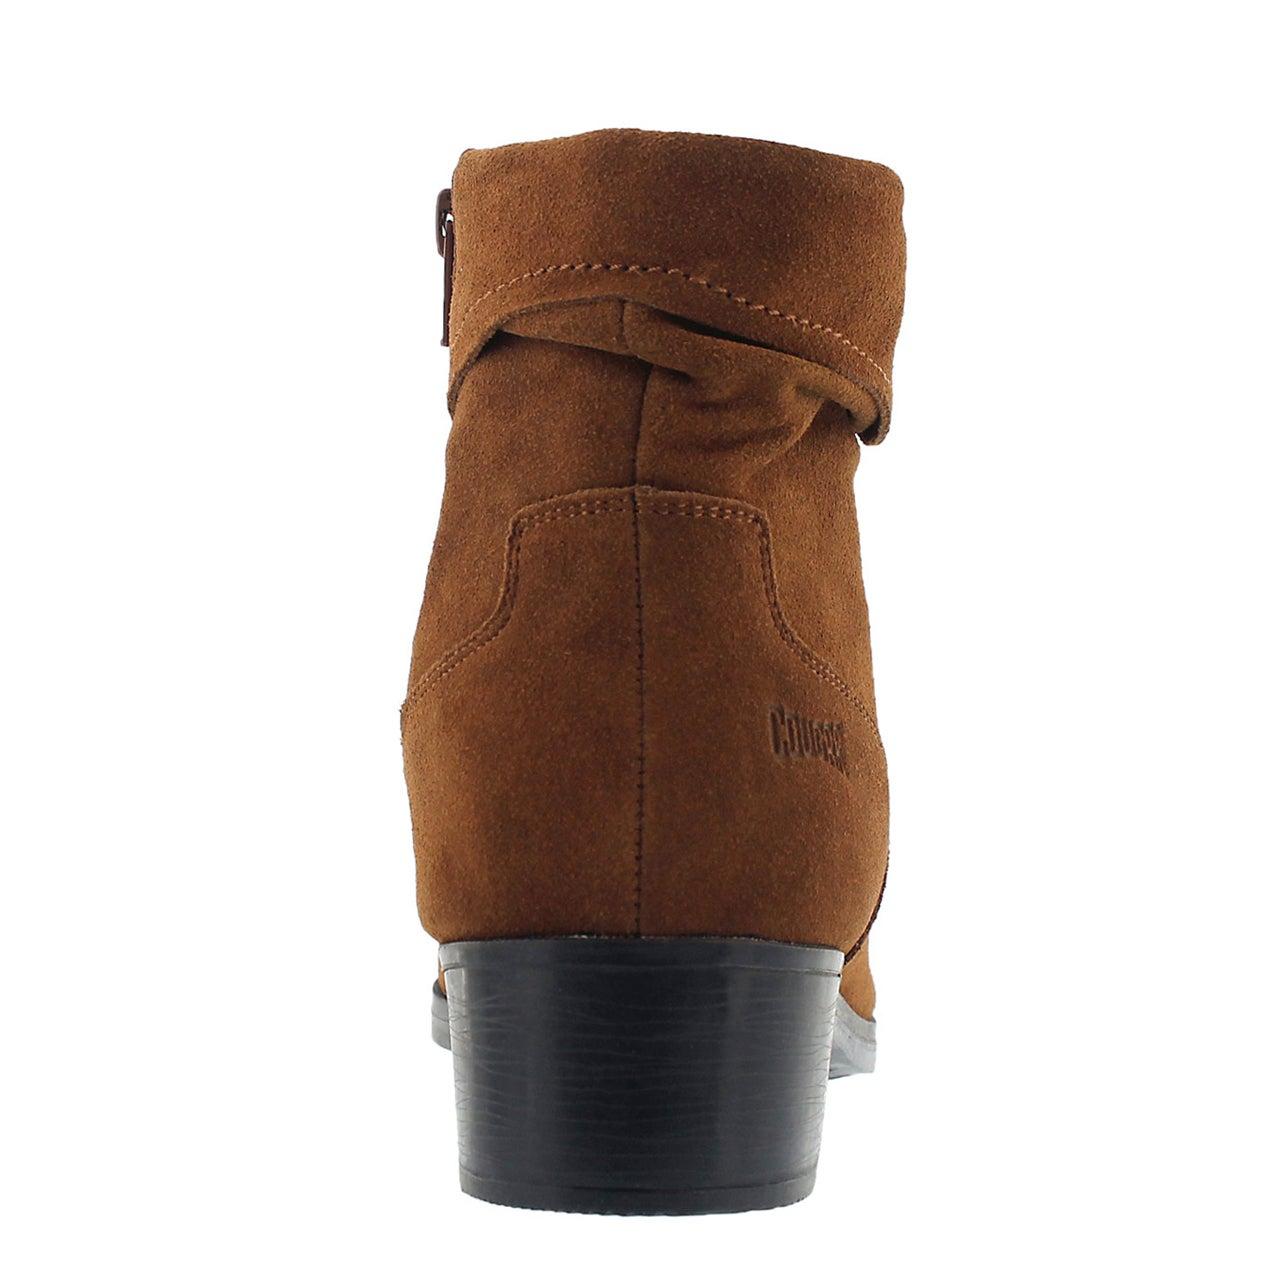 Lds Calinda chestnut wtpf ankle boot